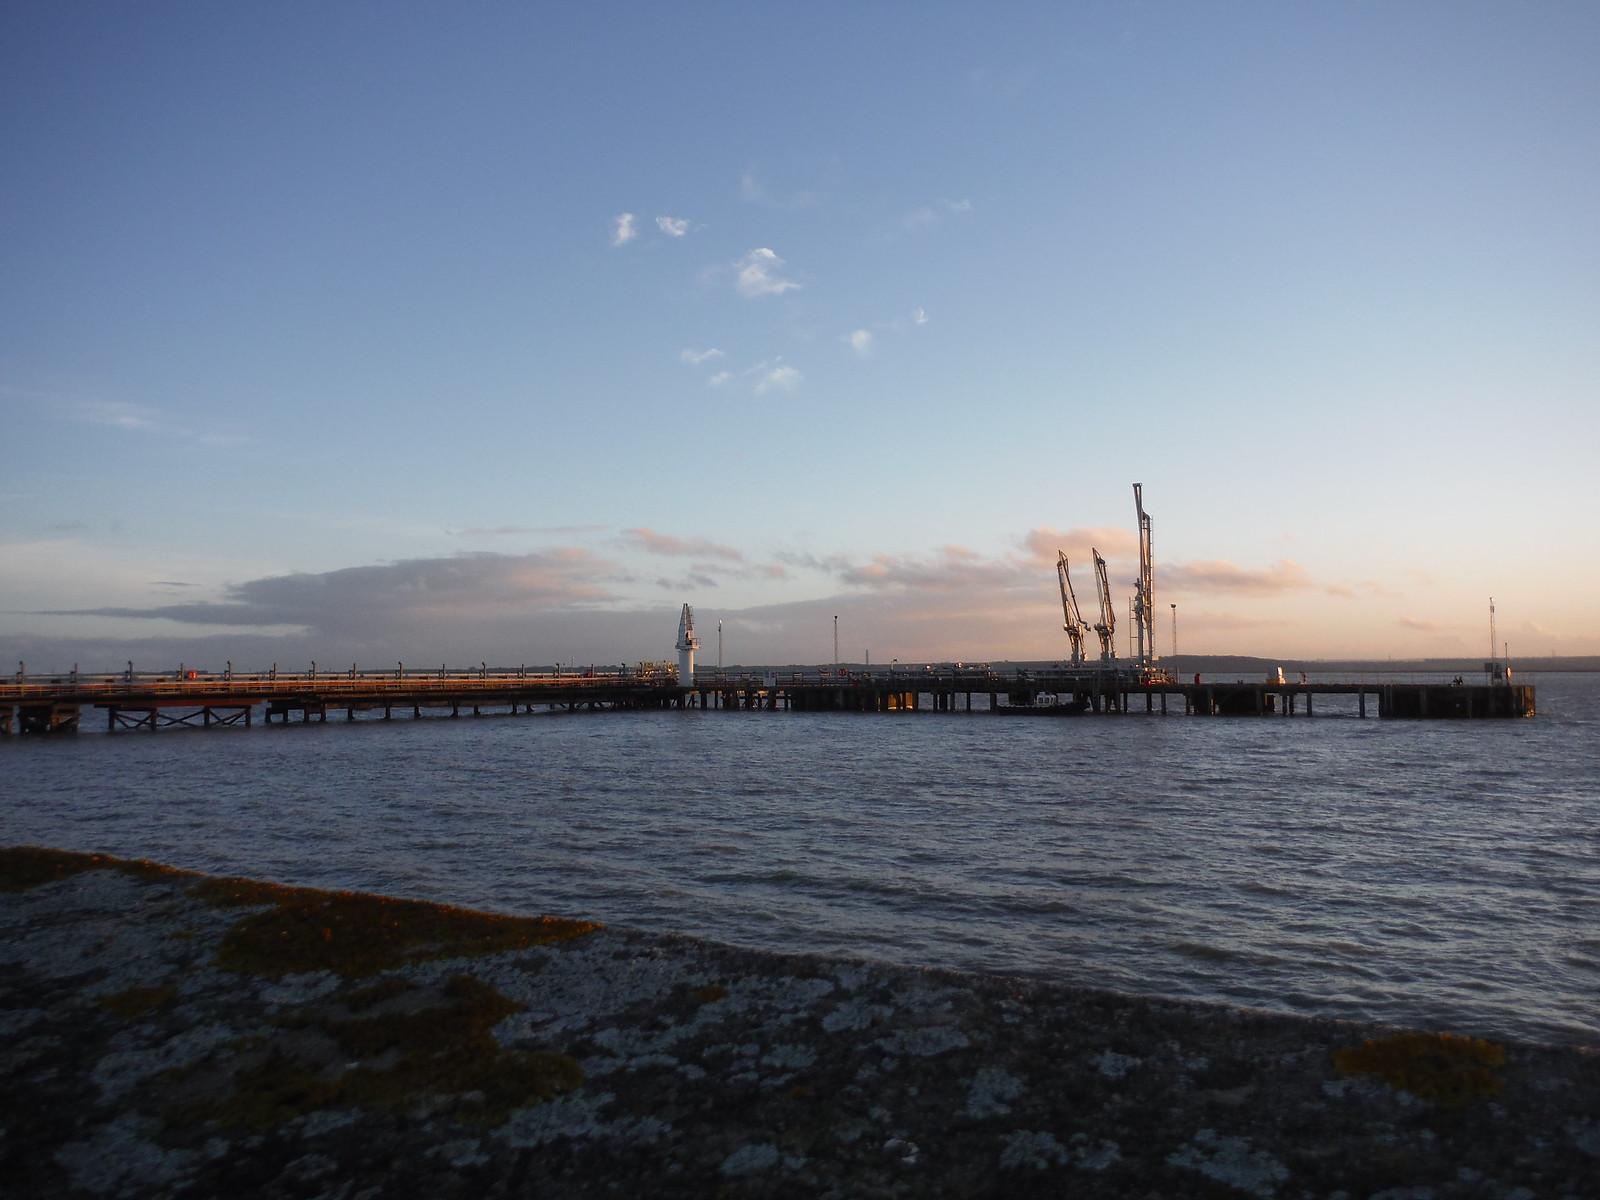 Jetty of Oikos Oil Product Terminal, Canvey Island SWC Walk 258 Benfleet Circular (via Canvey Island)